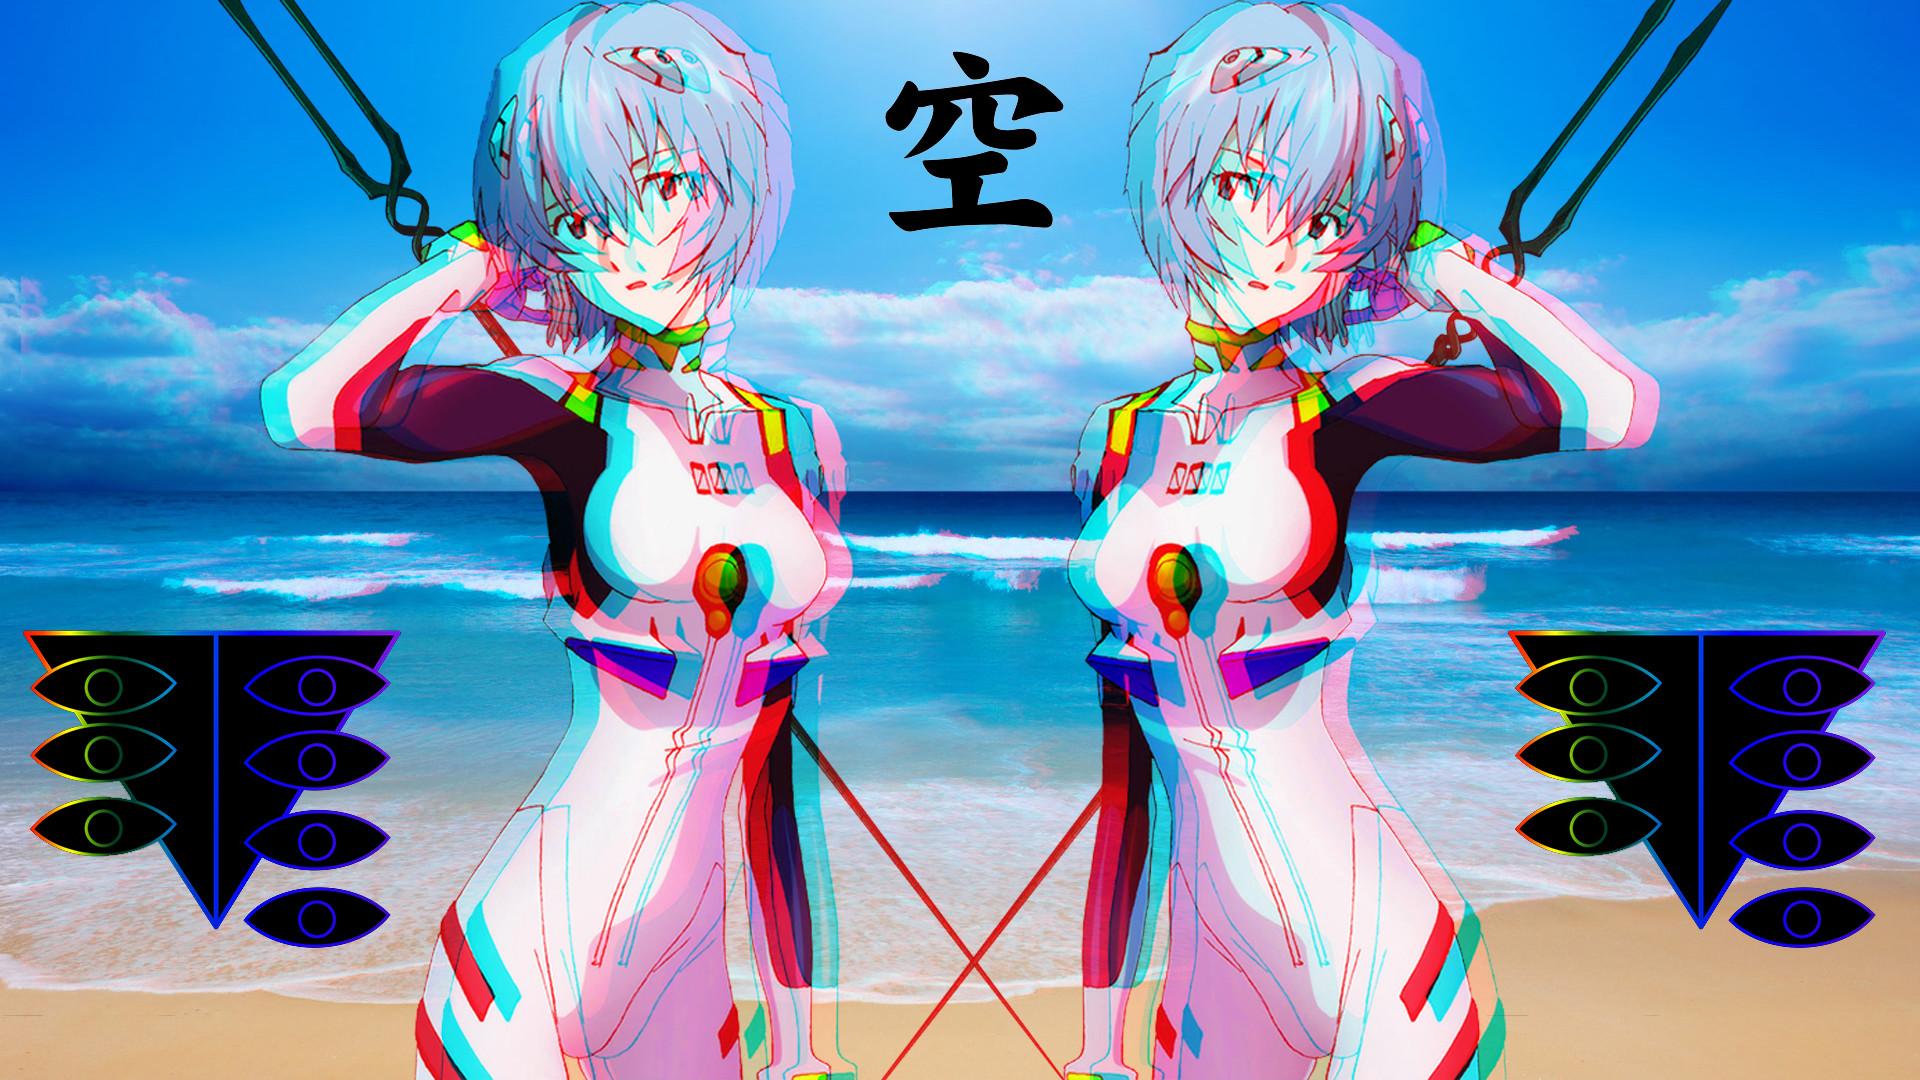 Anime – Neon Genesis Evangelion Rei Ayanami Spear of Longinus Wallpaper